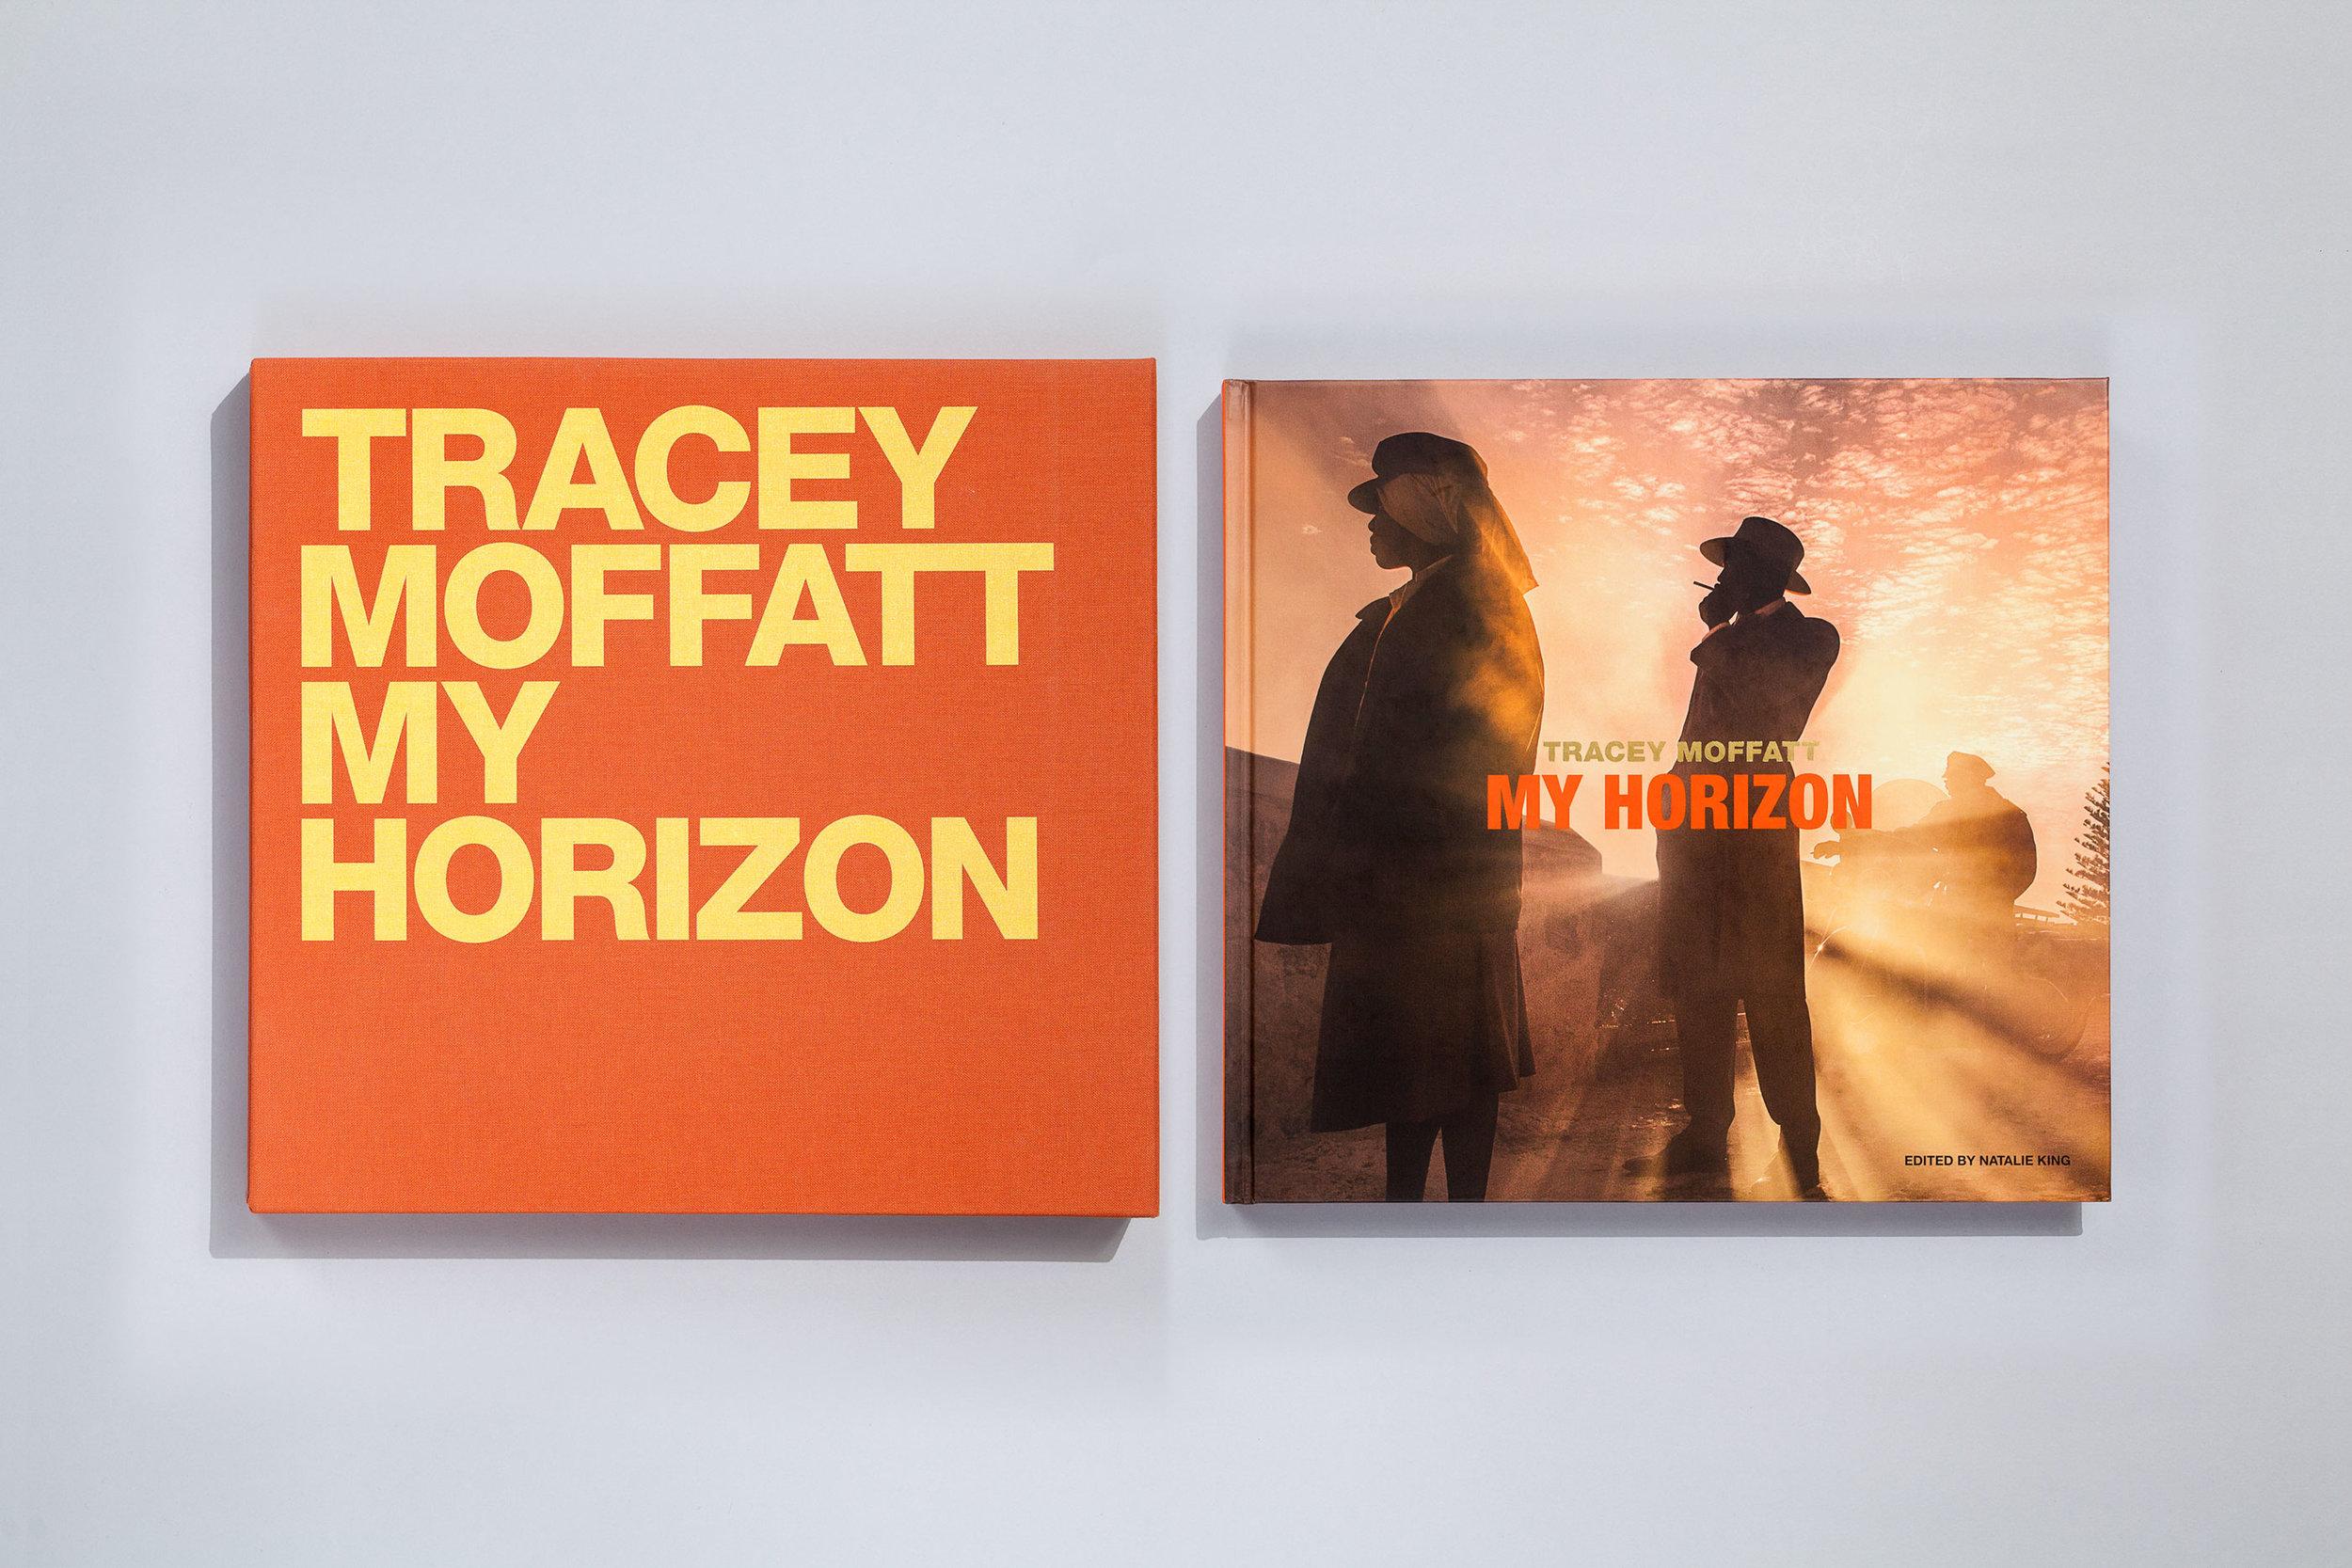 Title – Tracey Moffatt: My Horizon Artist – Tracey Moffatt Editor – Natalie King Designers – Daniel New & Evi O / OetomoNew Publisher – Thames & Hudson